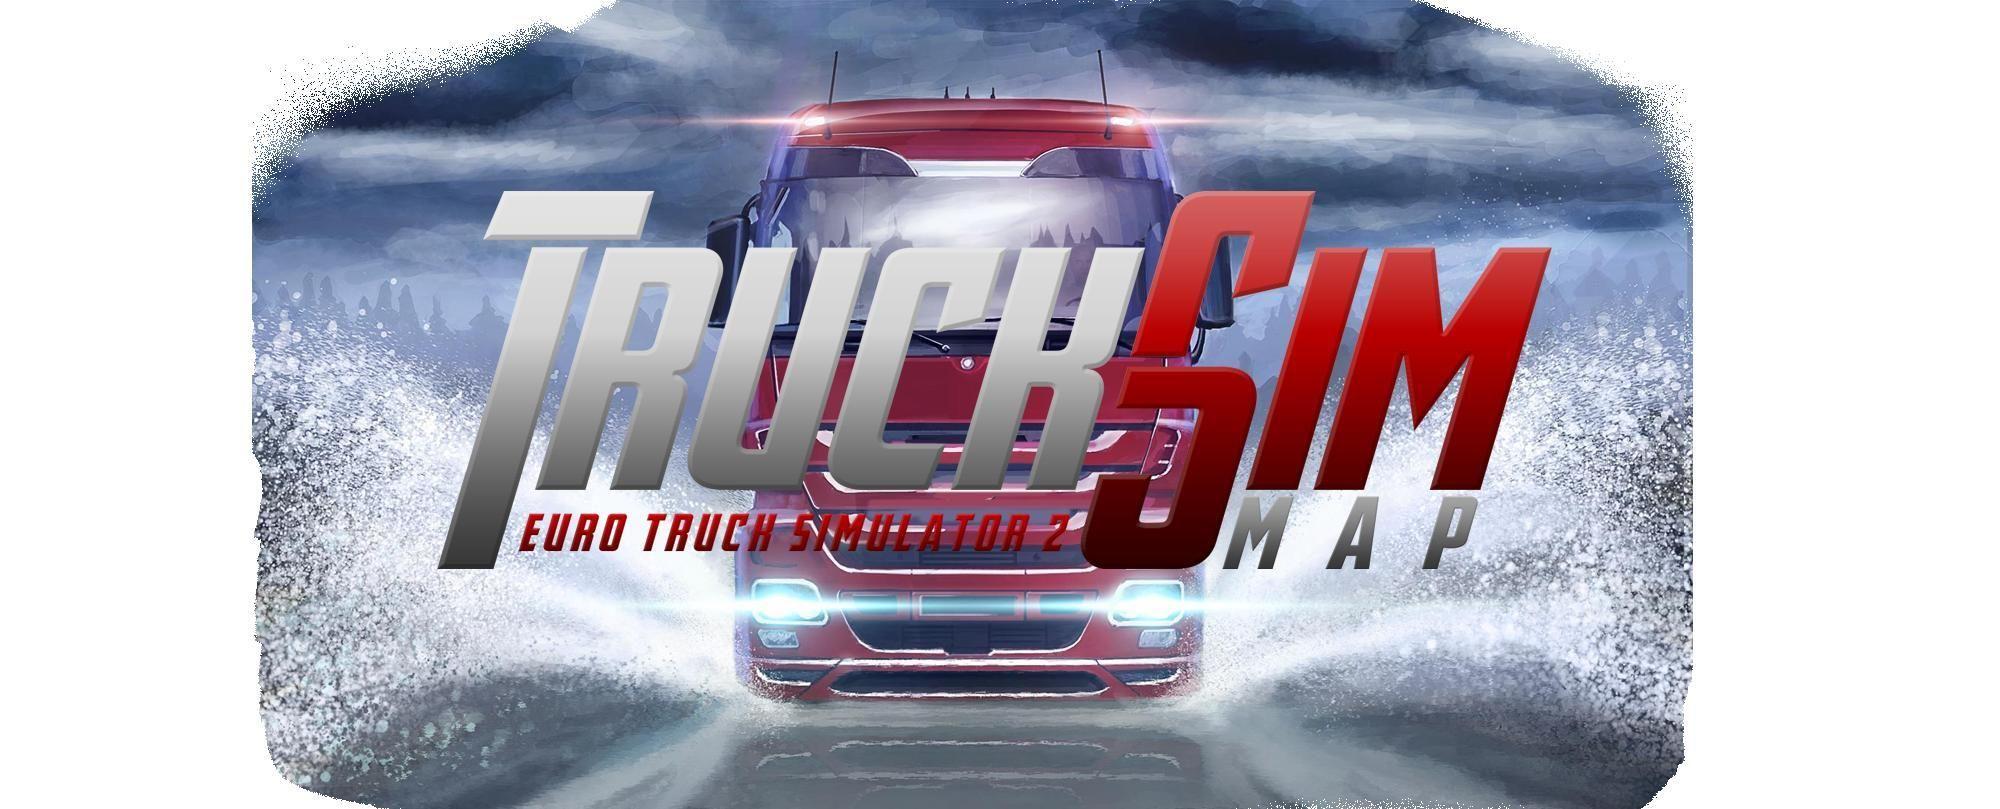 truck-sim-map-1